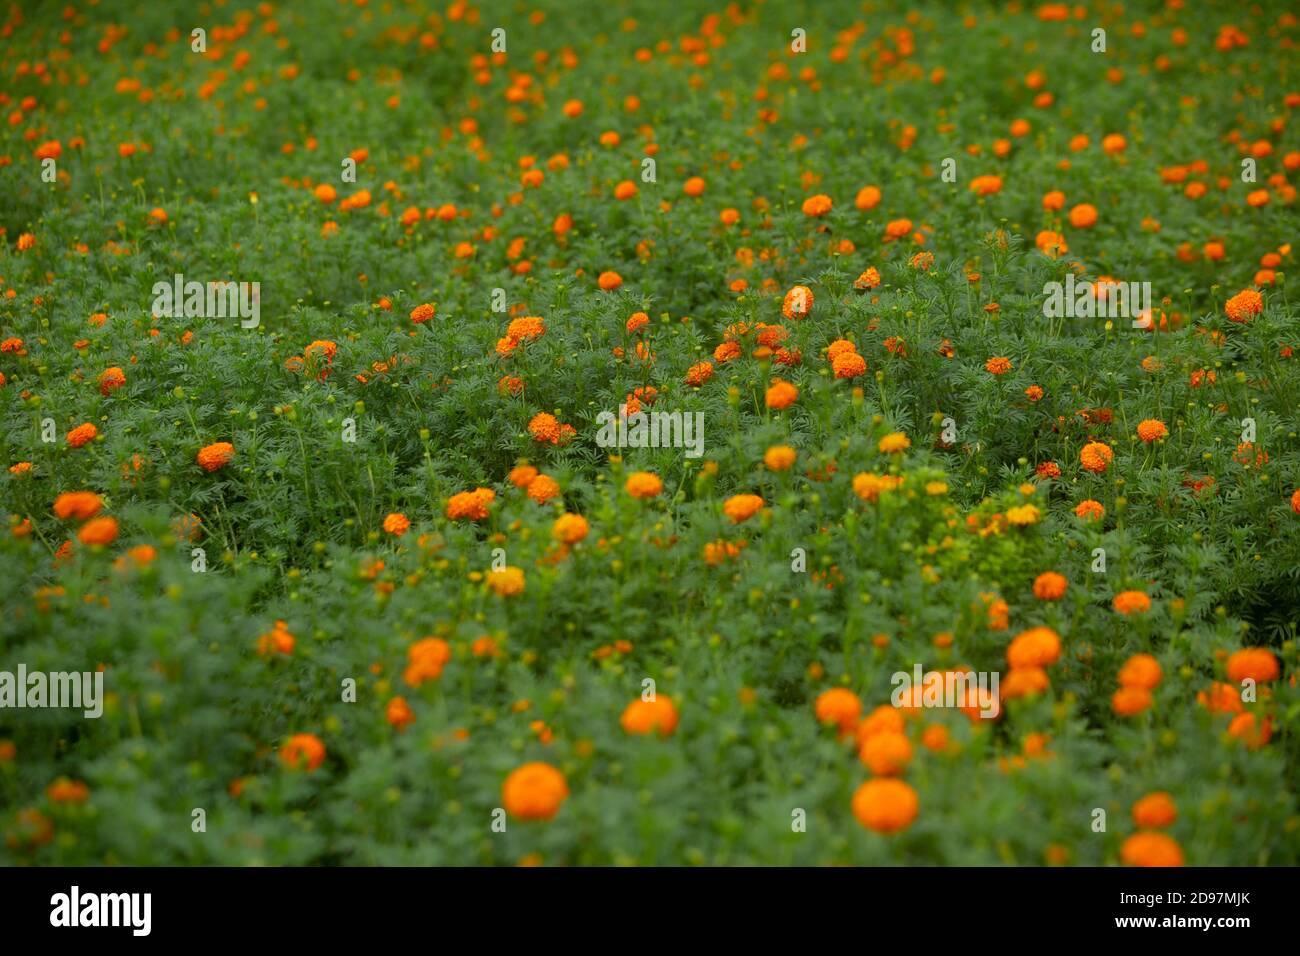 Beautiful blooming orange marigold flowers in the garden. Orange Green flowers background. Stock Photo